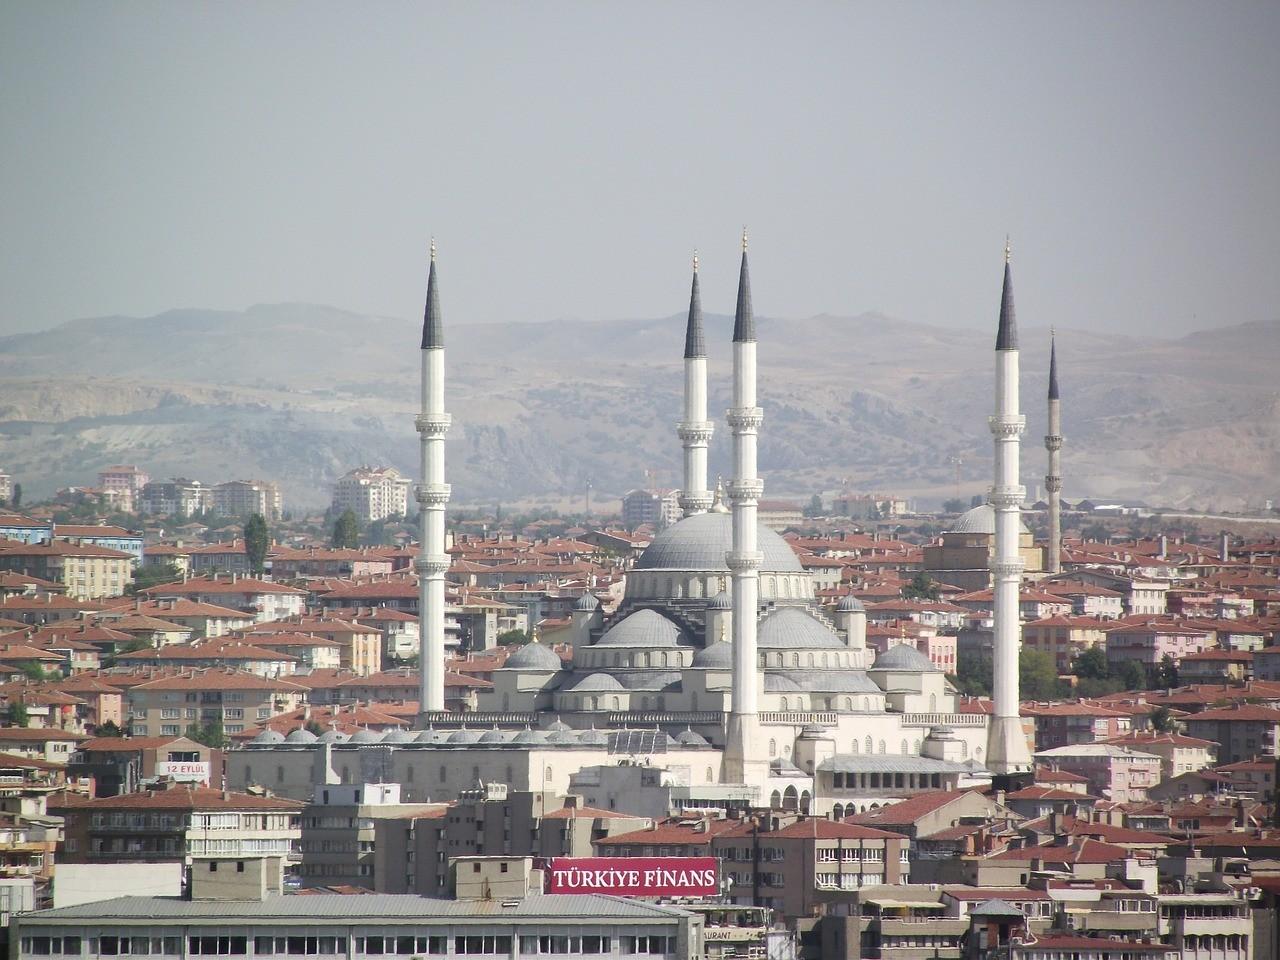 Города Турции. Анкара